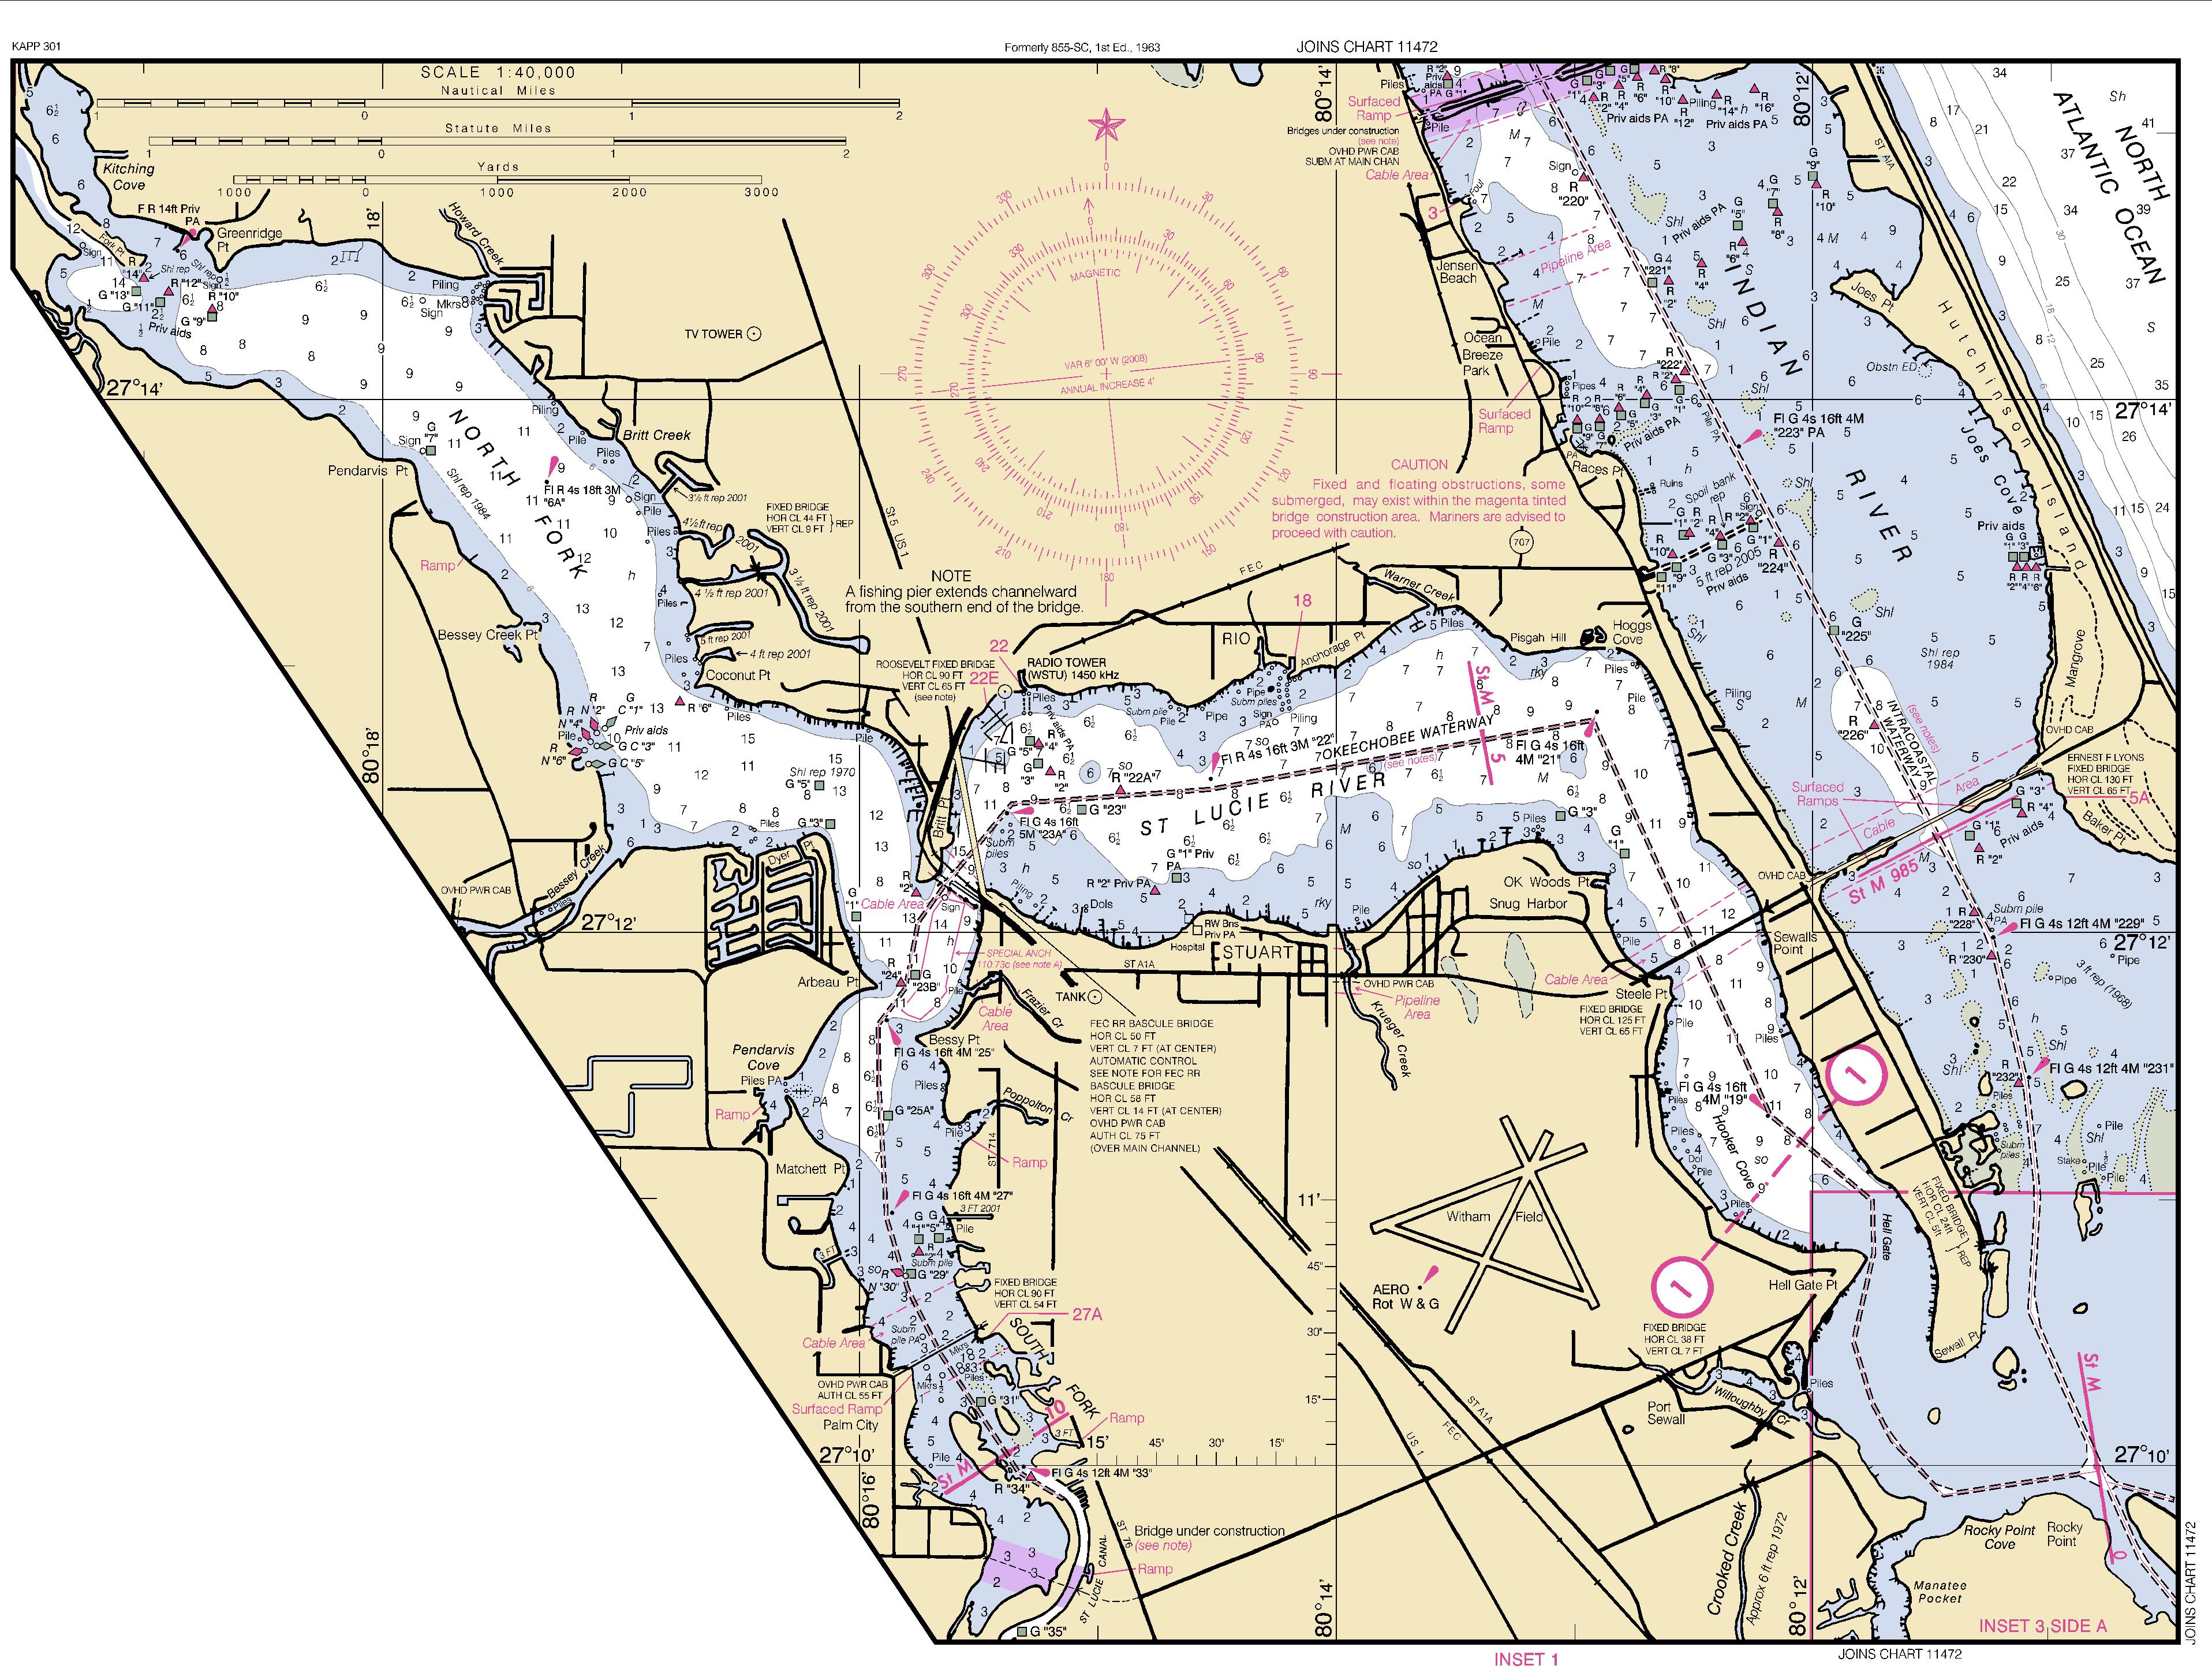 C-44 Canal | Jacqui Thurlow-Lippisch - Flood Zone Map Port St Lucie Florida